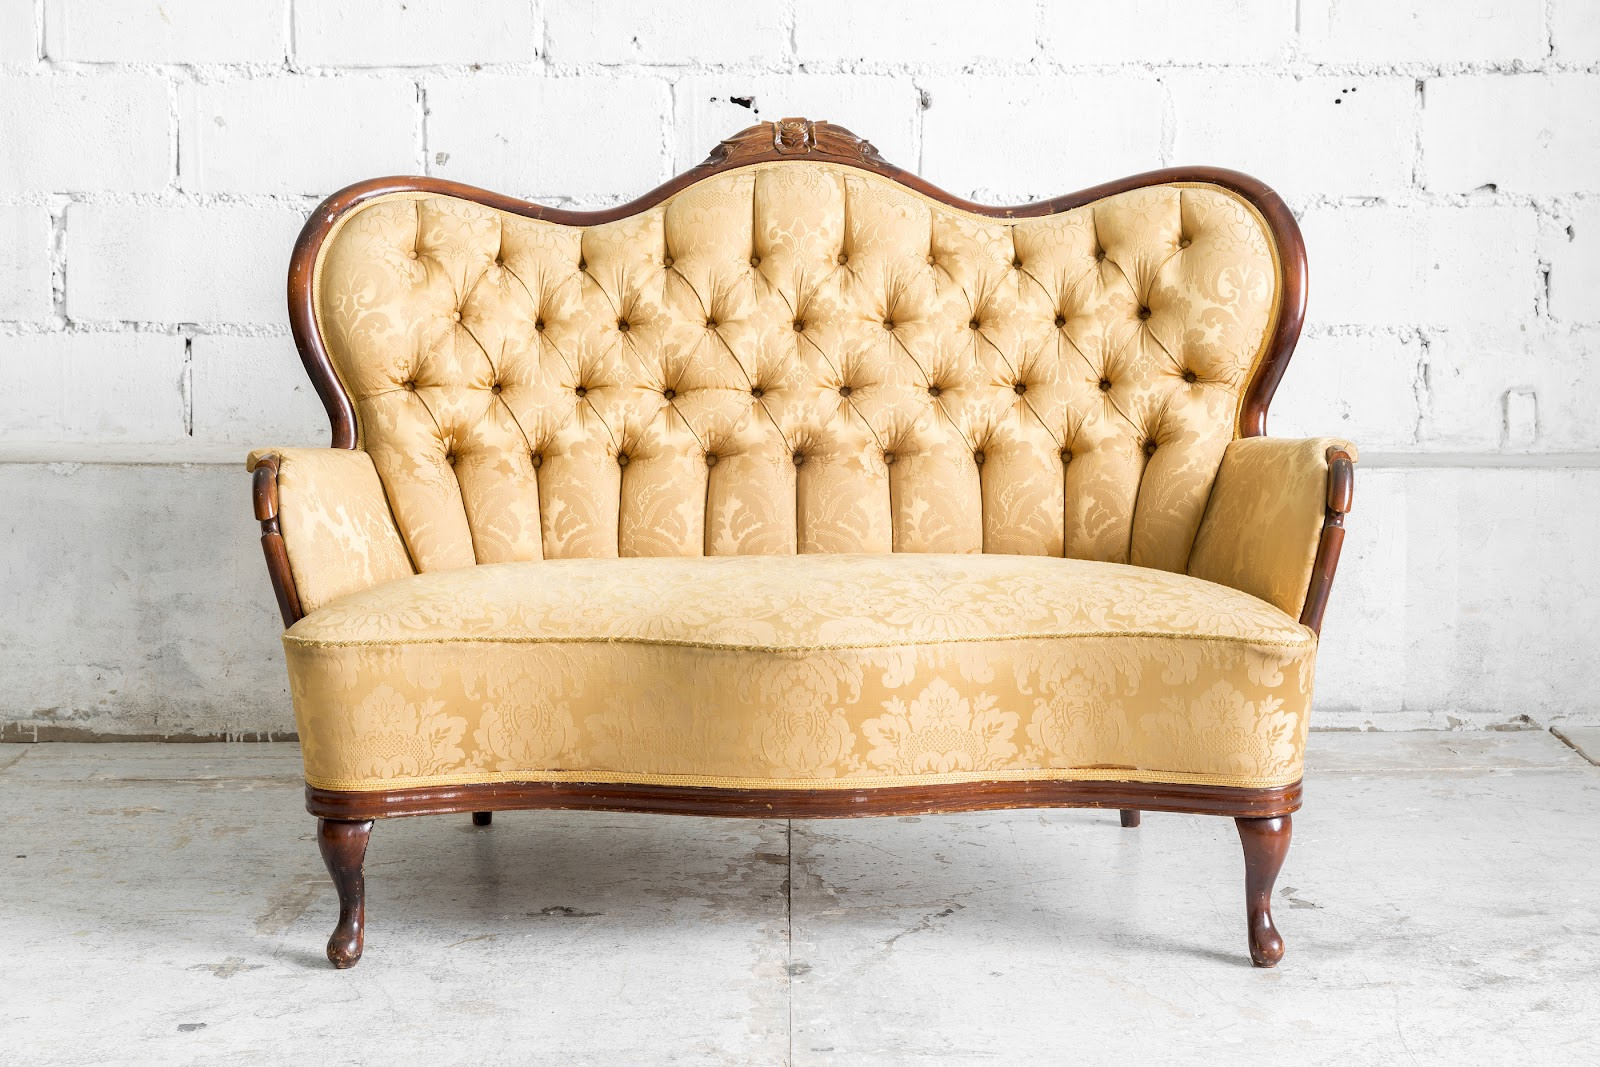 bigstock-Brown-Retro-classical-style-so-82584281.jpg